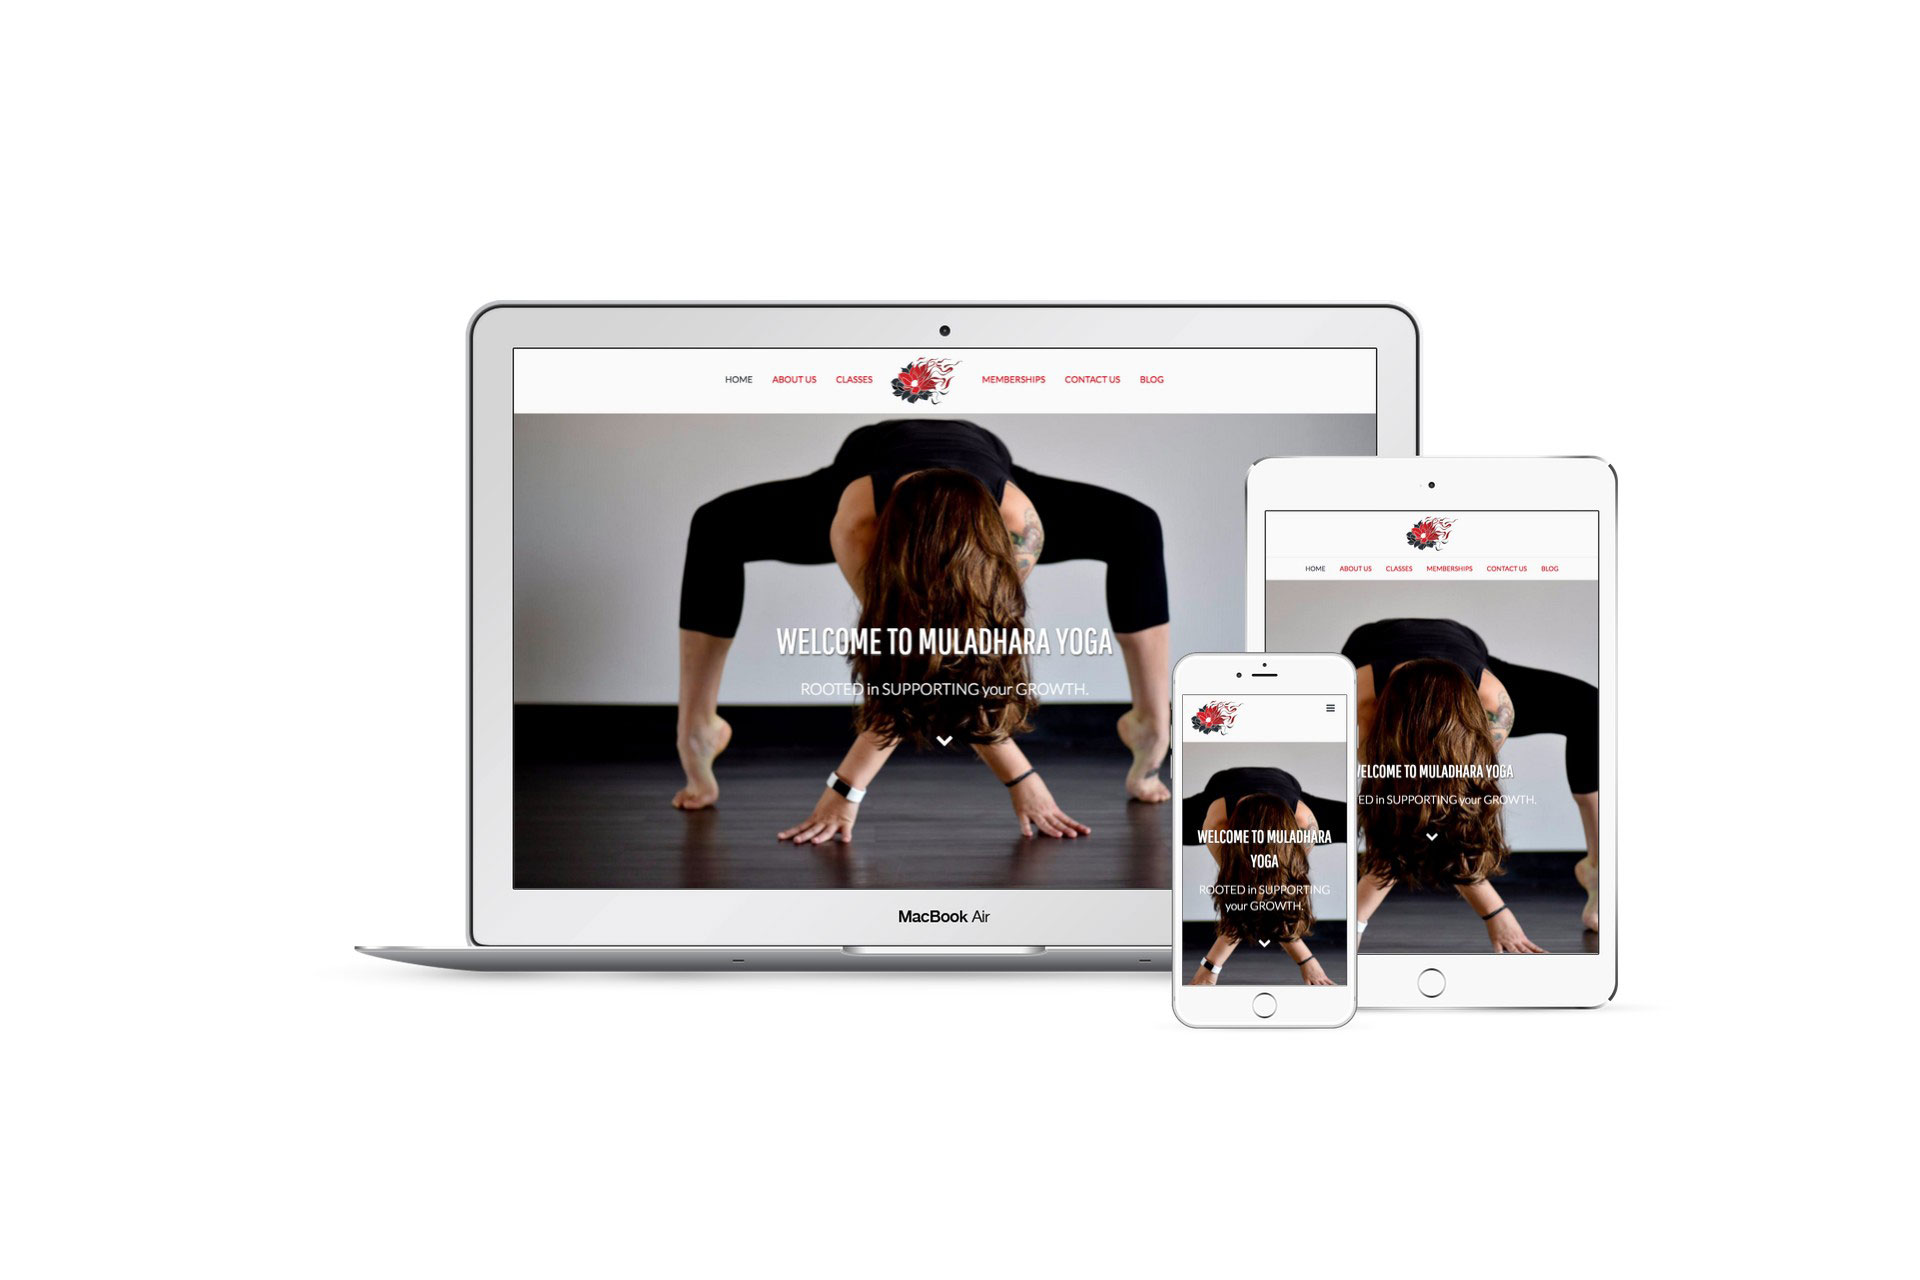 Muladhara Yoga mockup